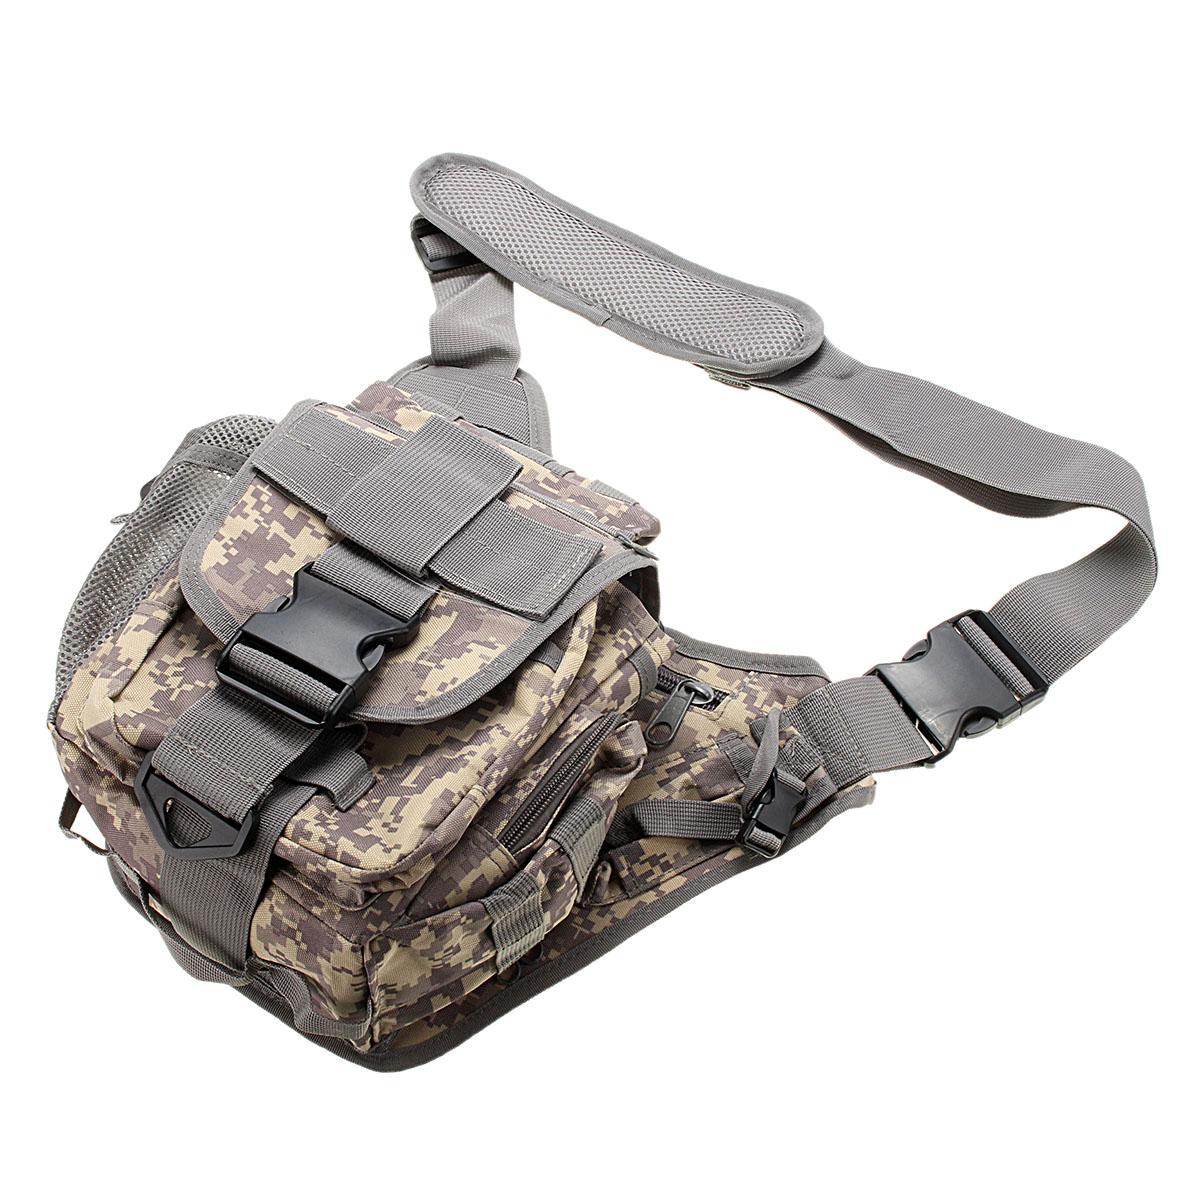 Military Tactical Backpack Camping Travel Hiking Trekking Shoulder Bags